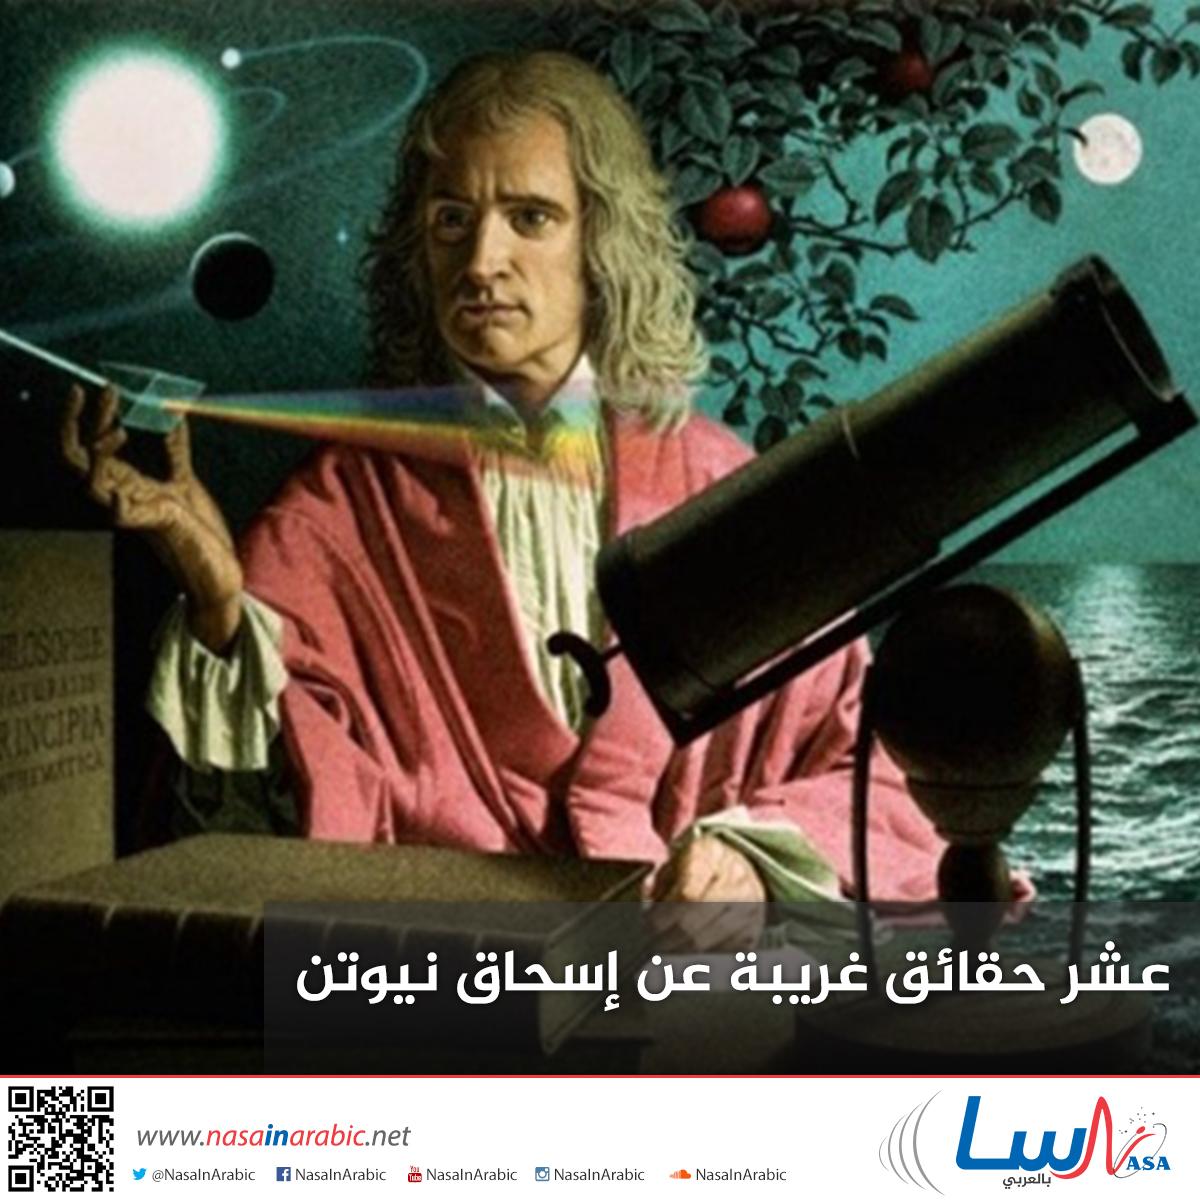 عشر حقائق غريبة عن نيوتن